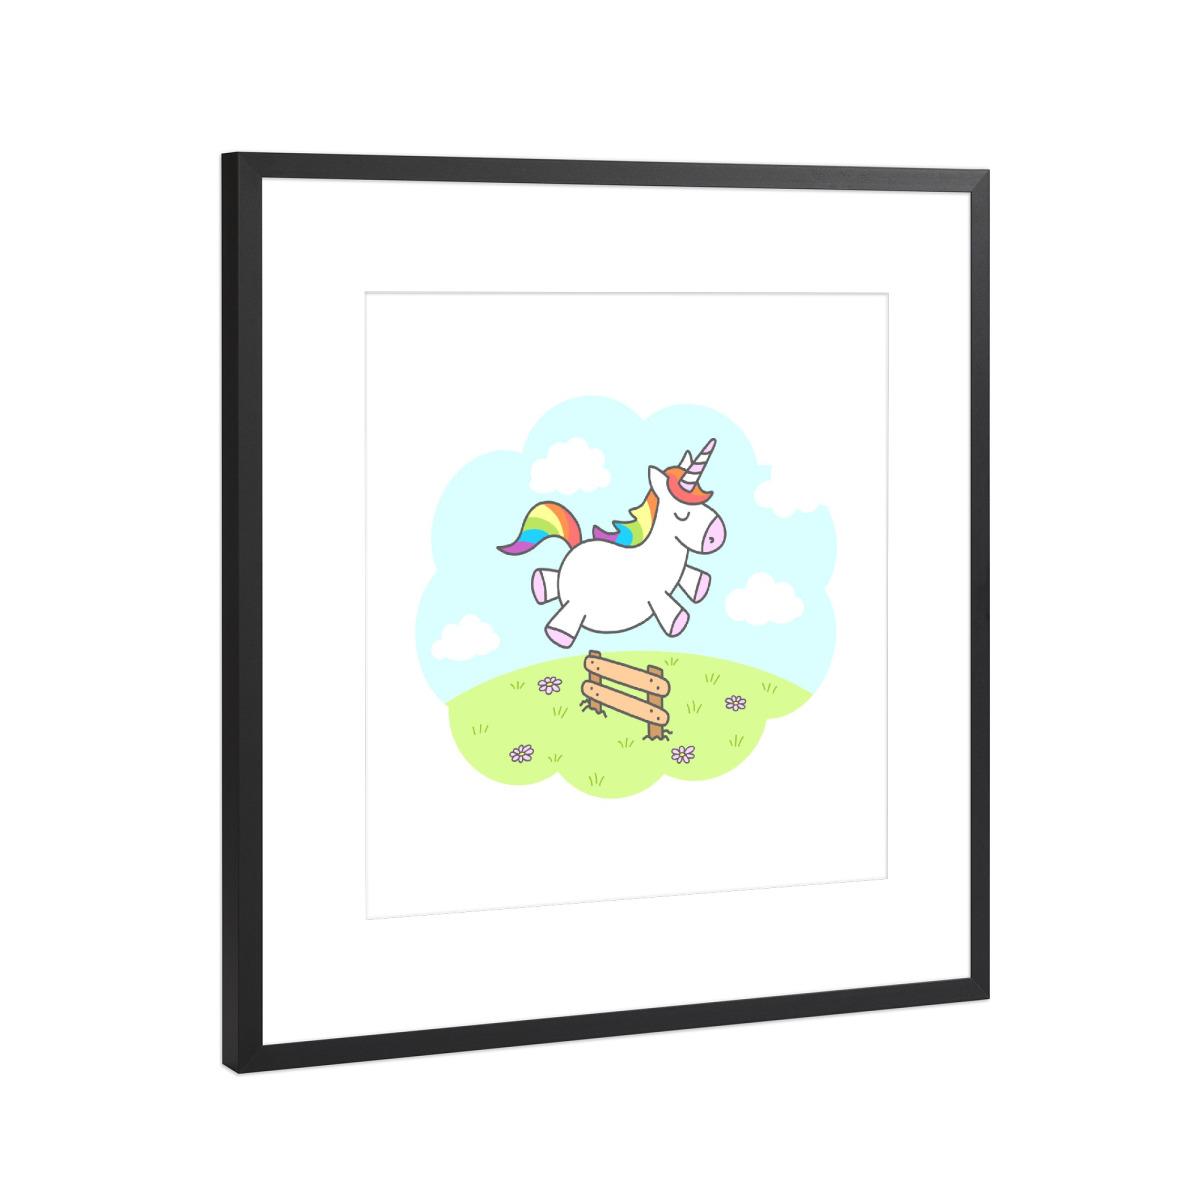 Unicorn Dream als Gerahmt bei artboxONE kaufen